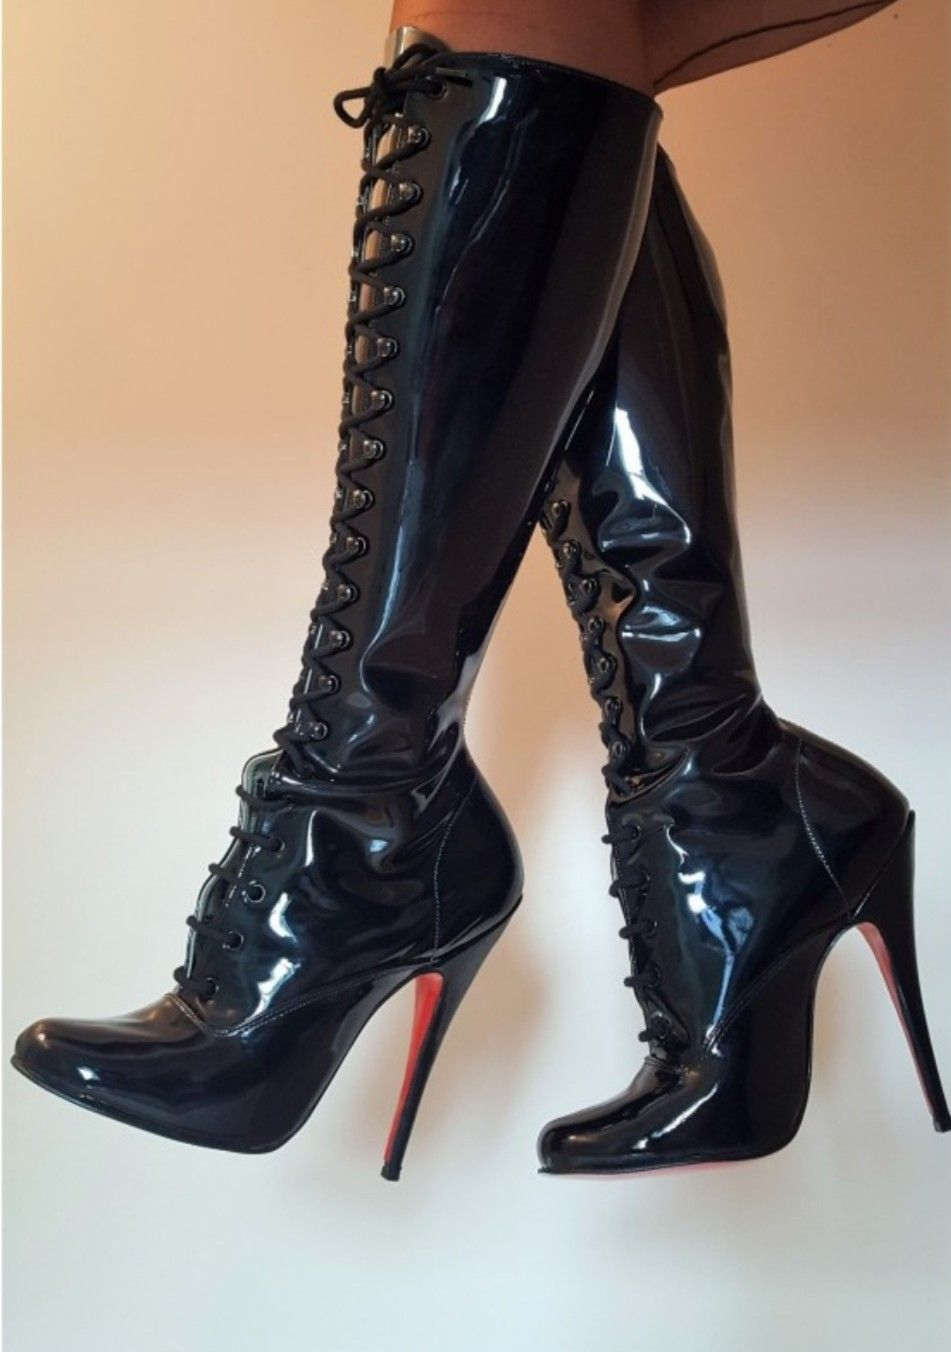 a478ab3af6c77 Plastic Boots, Black Leather Gloves, High Heels Stilettos, Stiletto Heels,  Sexy Boots